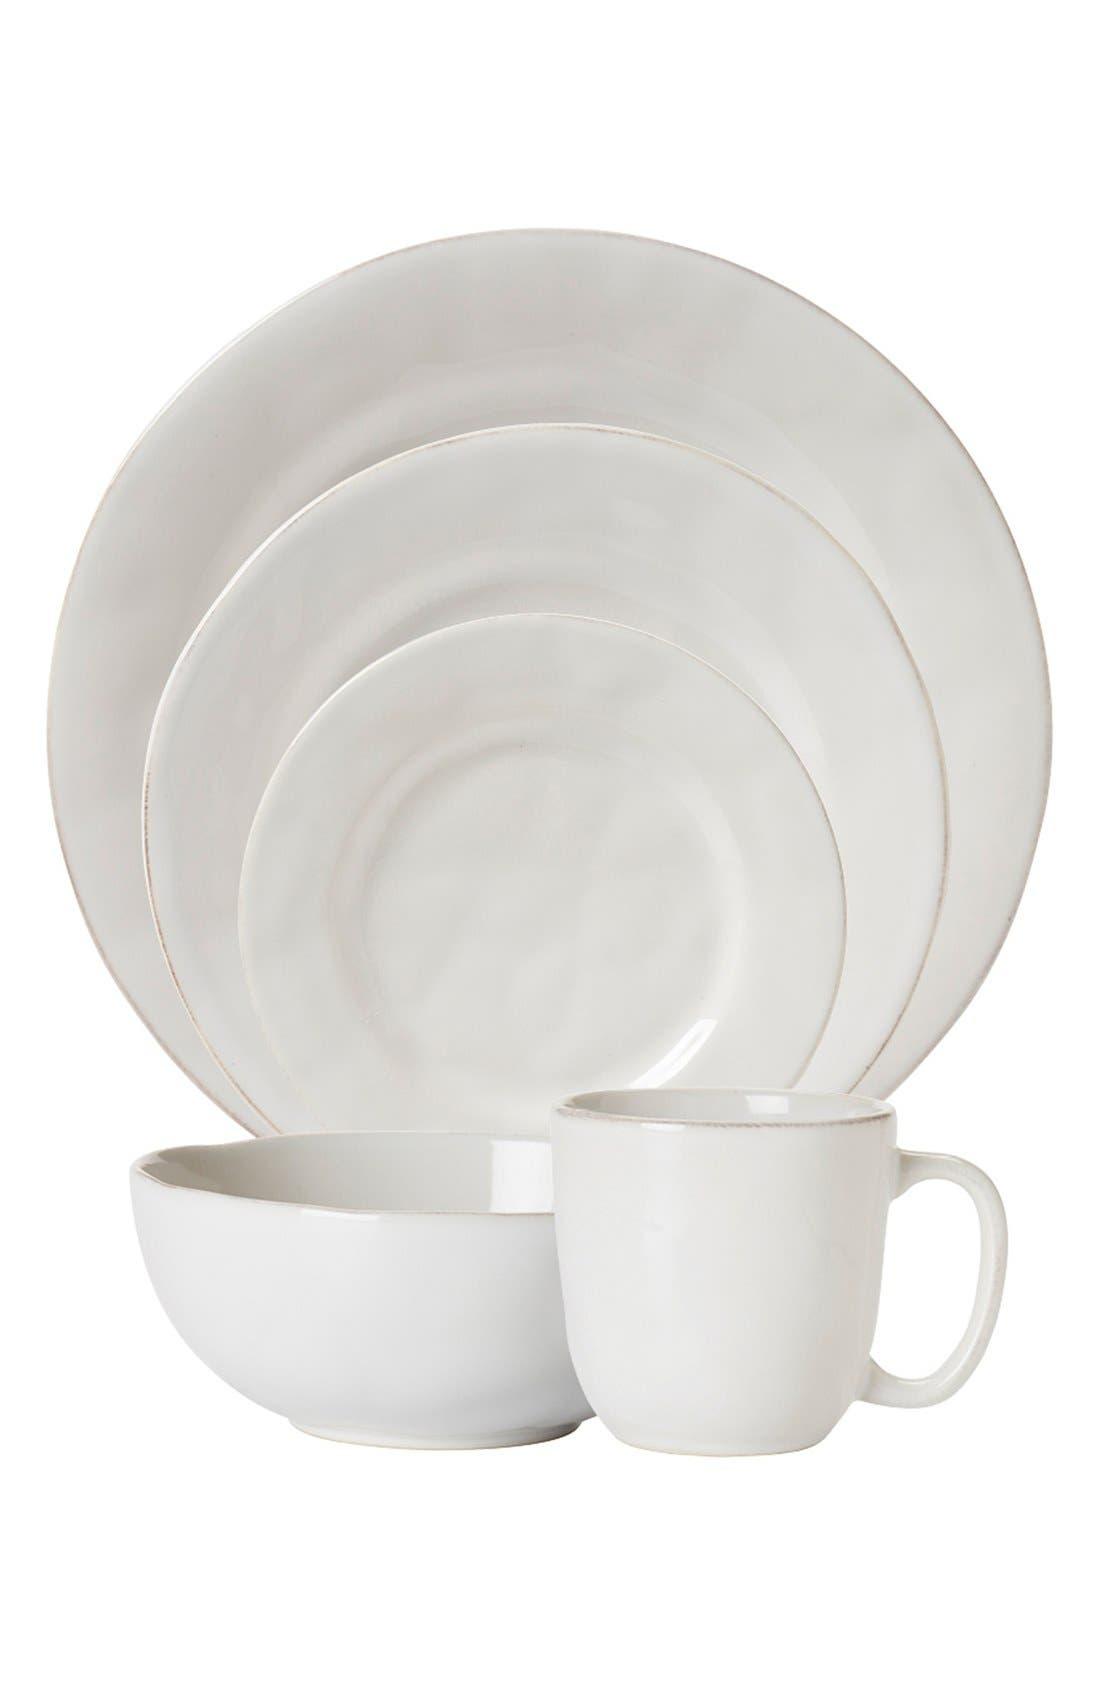 'Puro' 5-Piece Dinnerware Place Setting,                         Main,                         color, WHITE